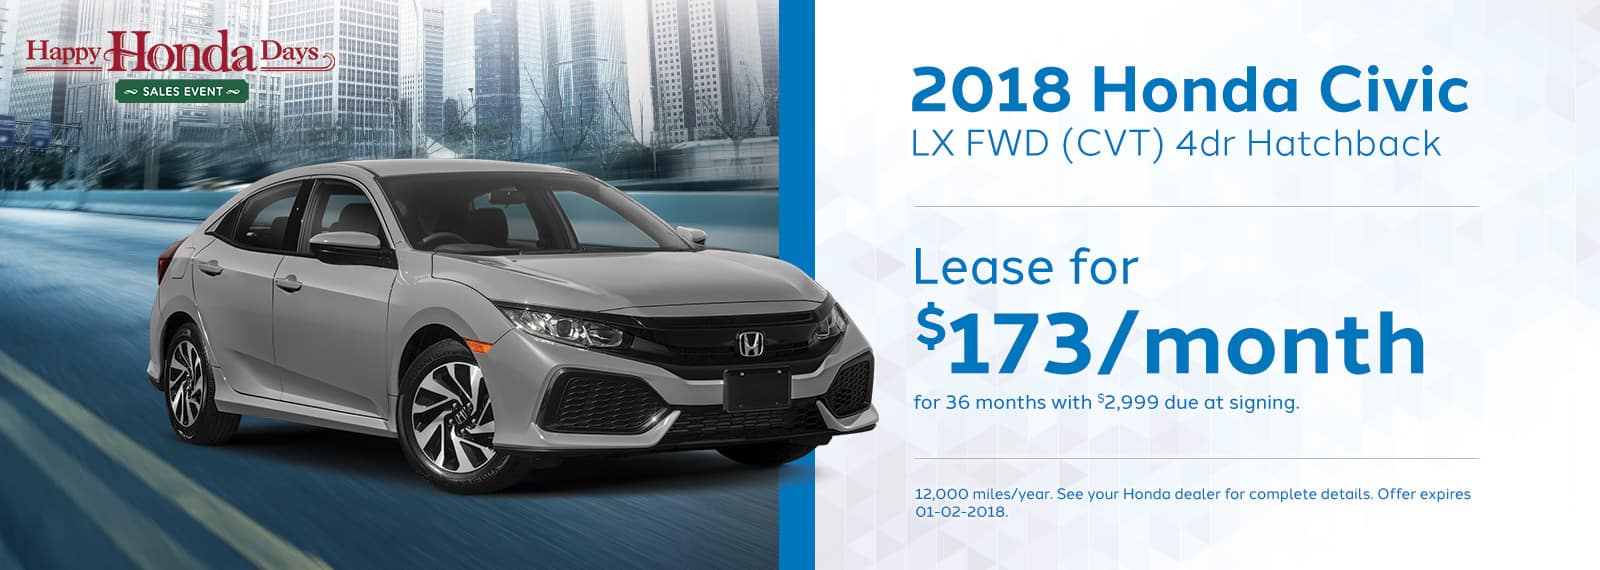 GENHONDA_Happy Honda Days Homepage_1600x570_Civic-LX-Hatchback